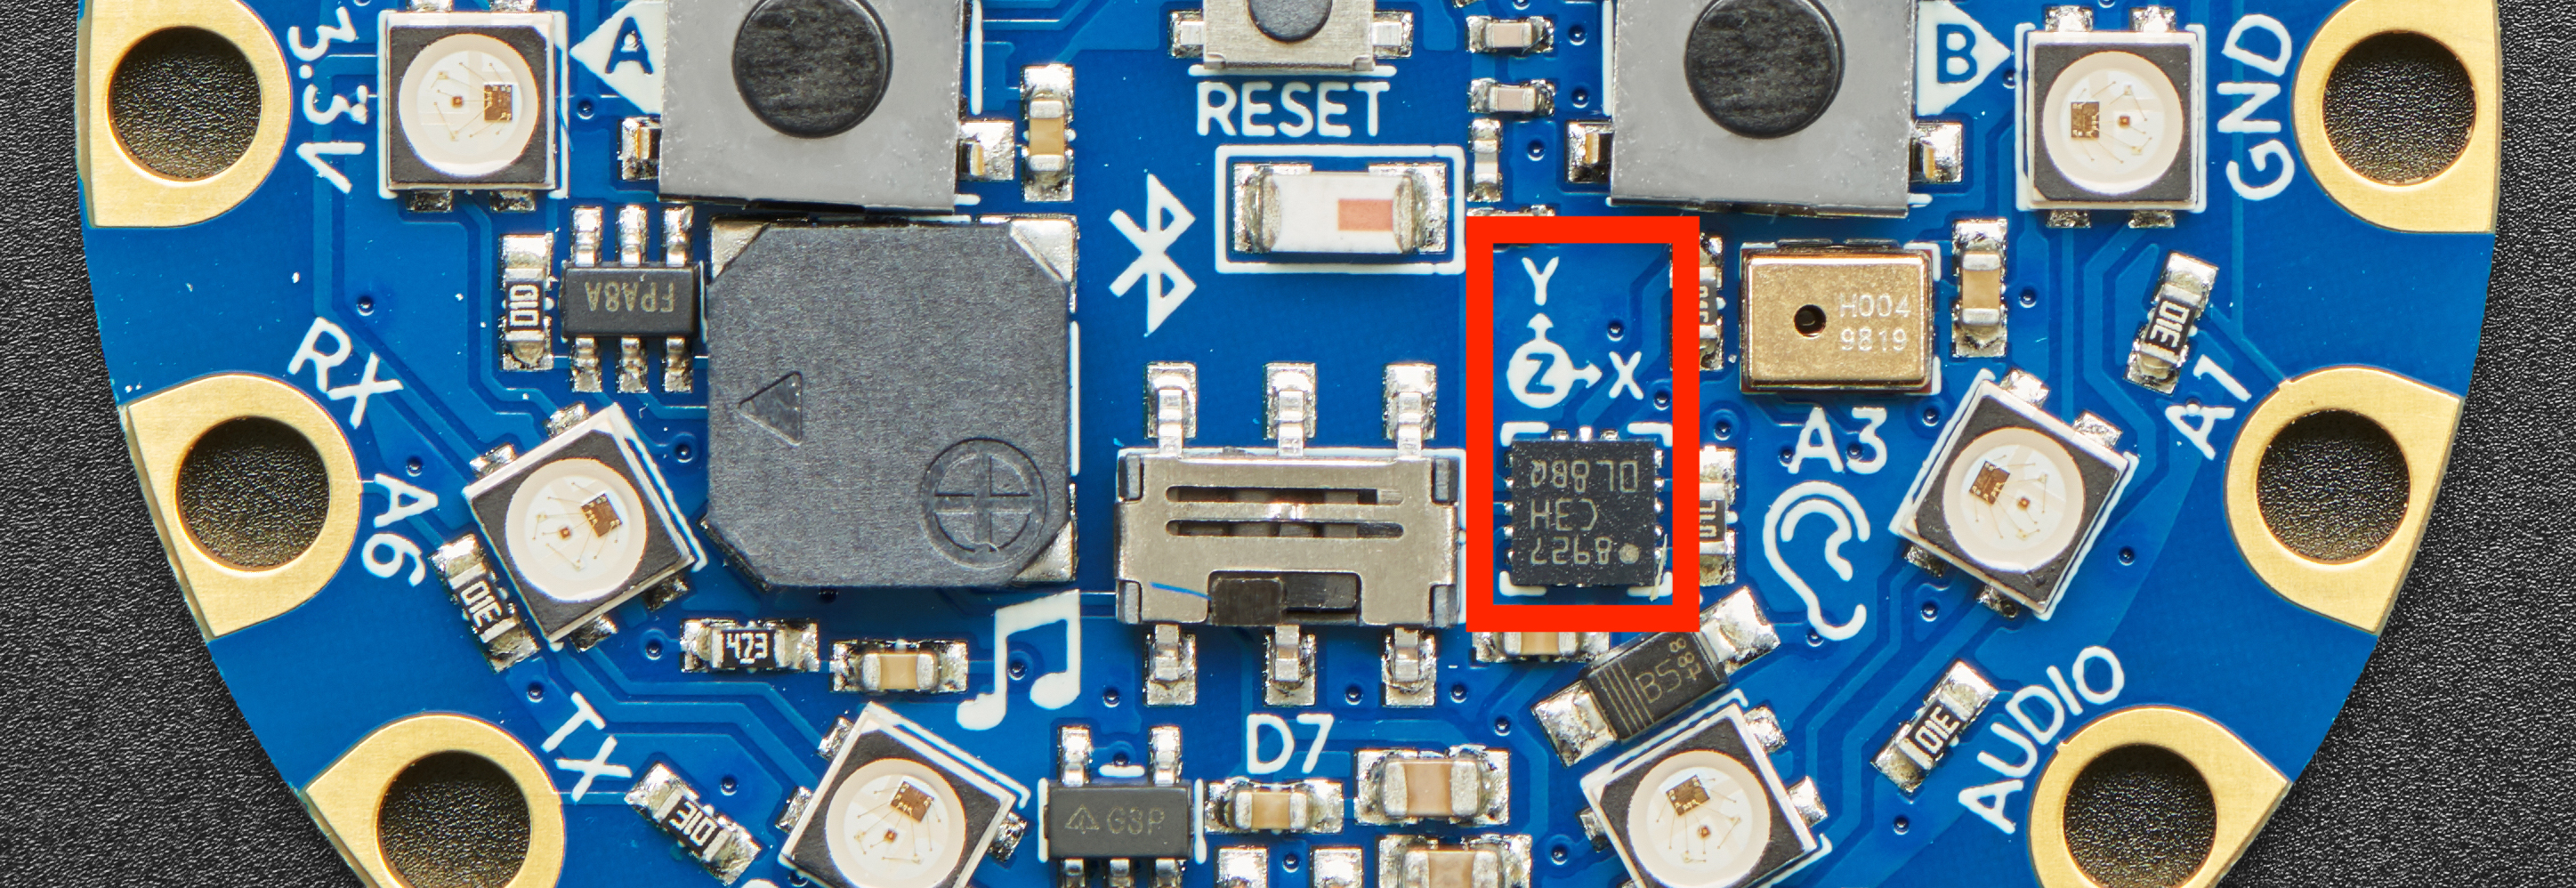 circuitpython_Circuit_Playground_Bluefruit_Accelerometer.jpeg